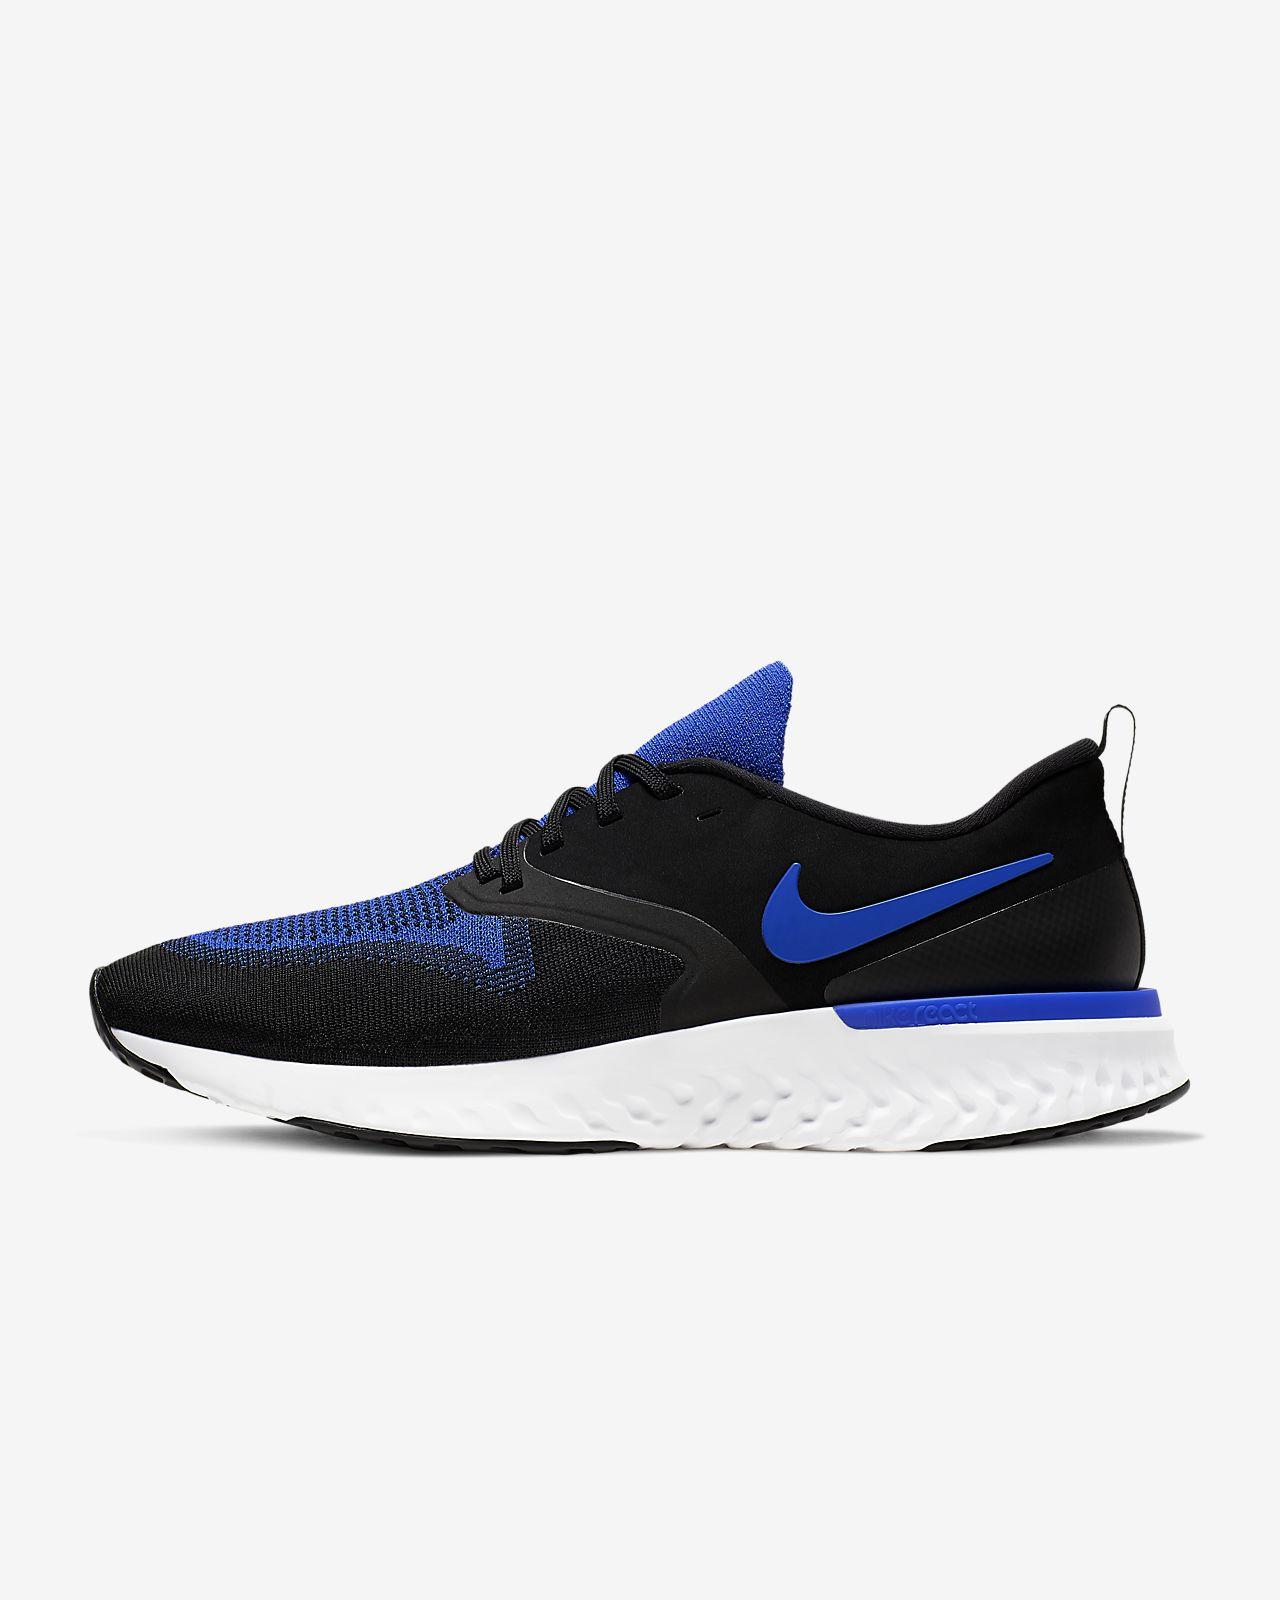 Nike Odyssey React Flyknit 2 Zapatillas de running - Hombre